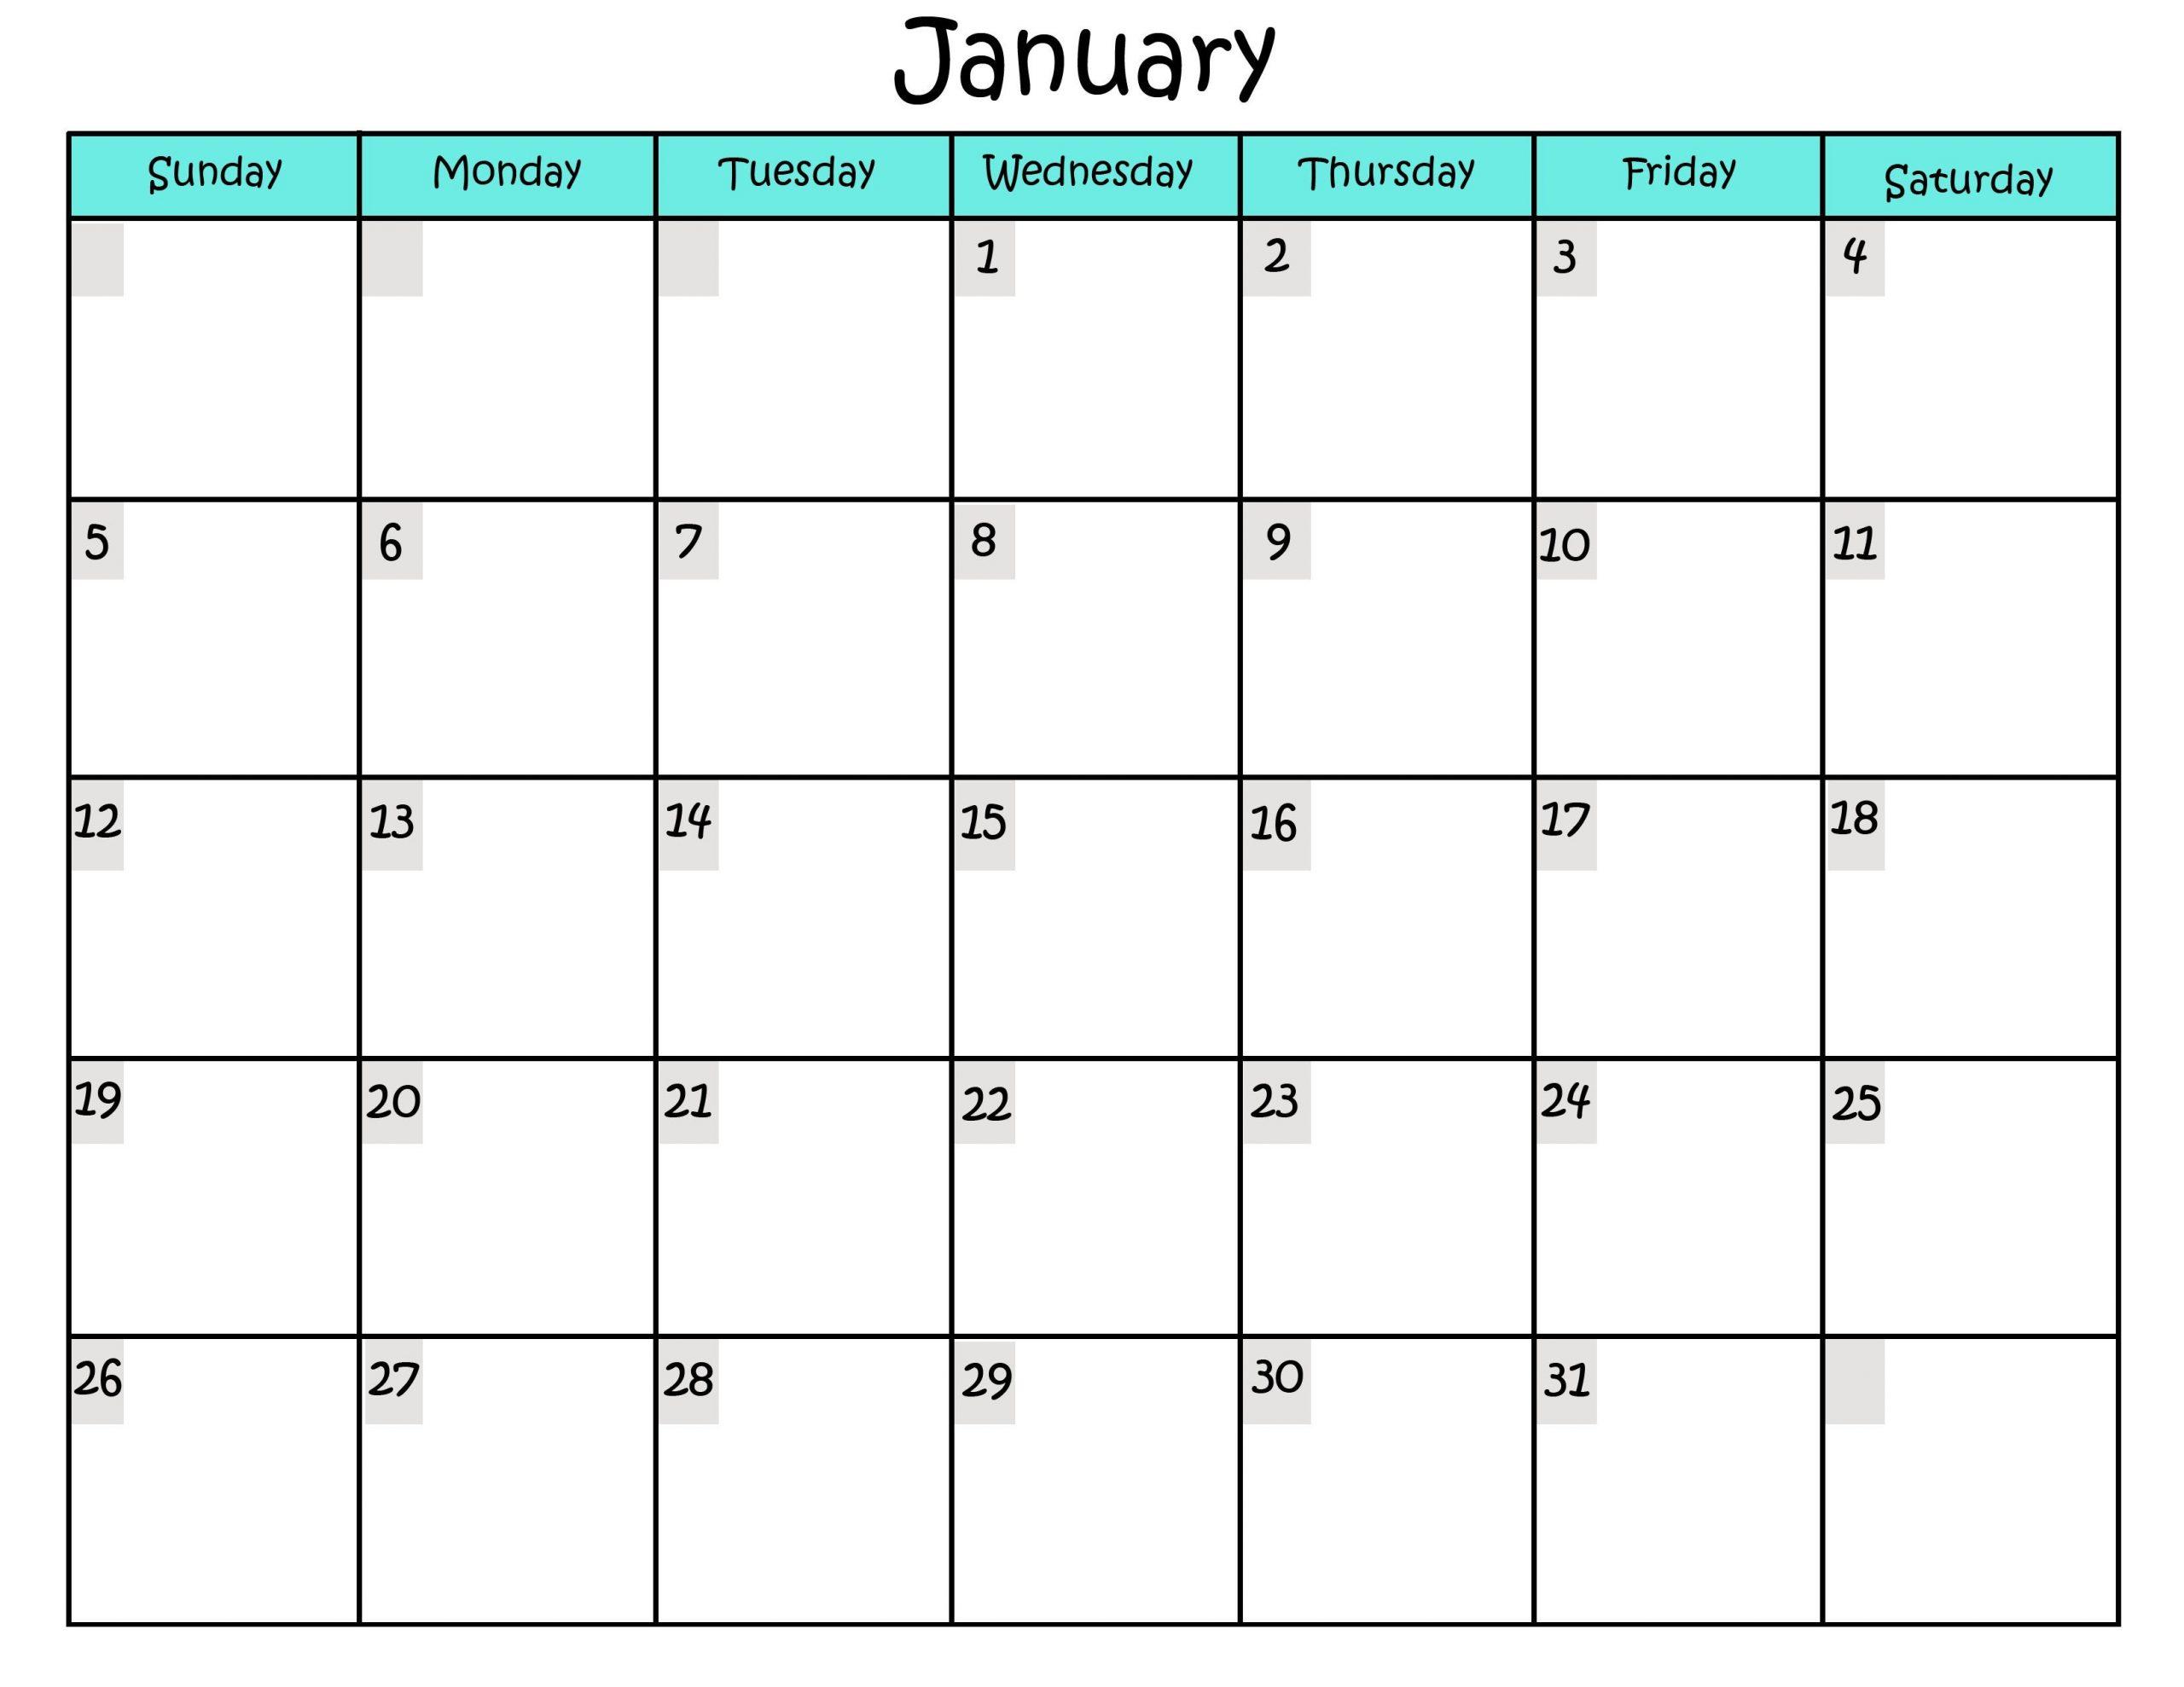 Sample Calendars To Print | Activity Shelter Calanda Templete That I Can Edit